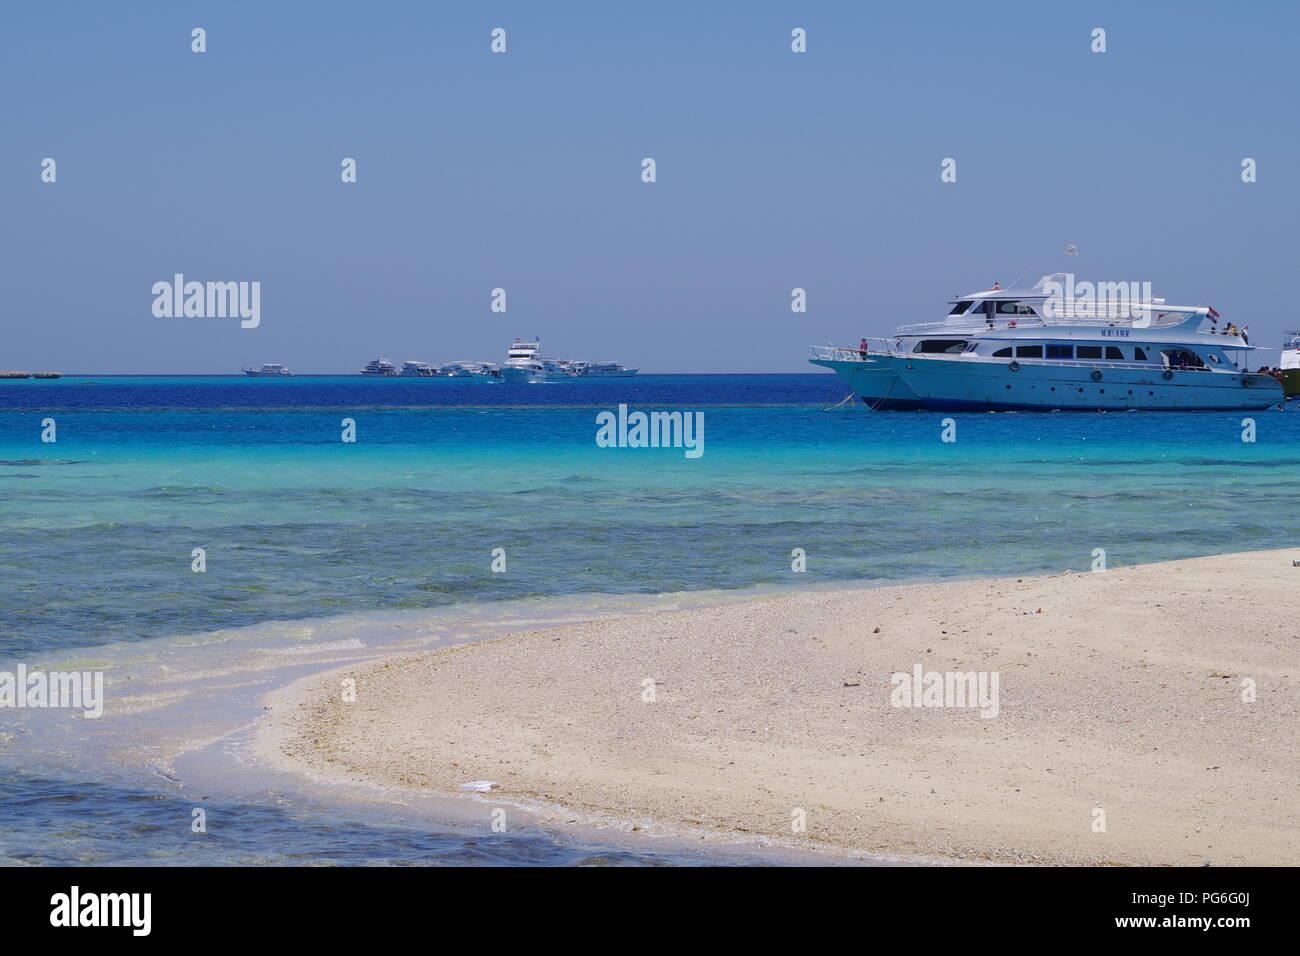 Pleasure cruisers off Mahmya, Giftun Island on the Red Sea , Egypt - Stock Image